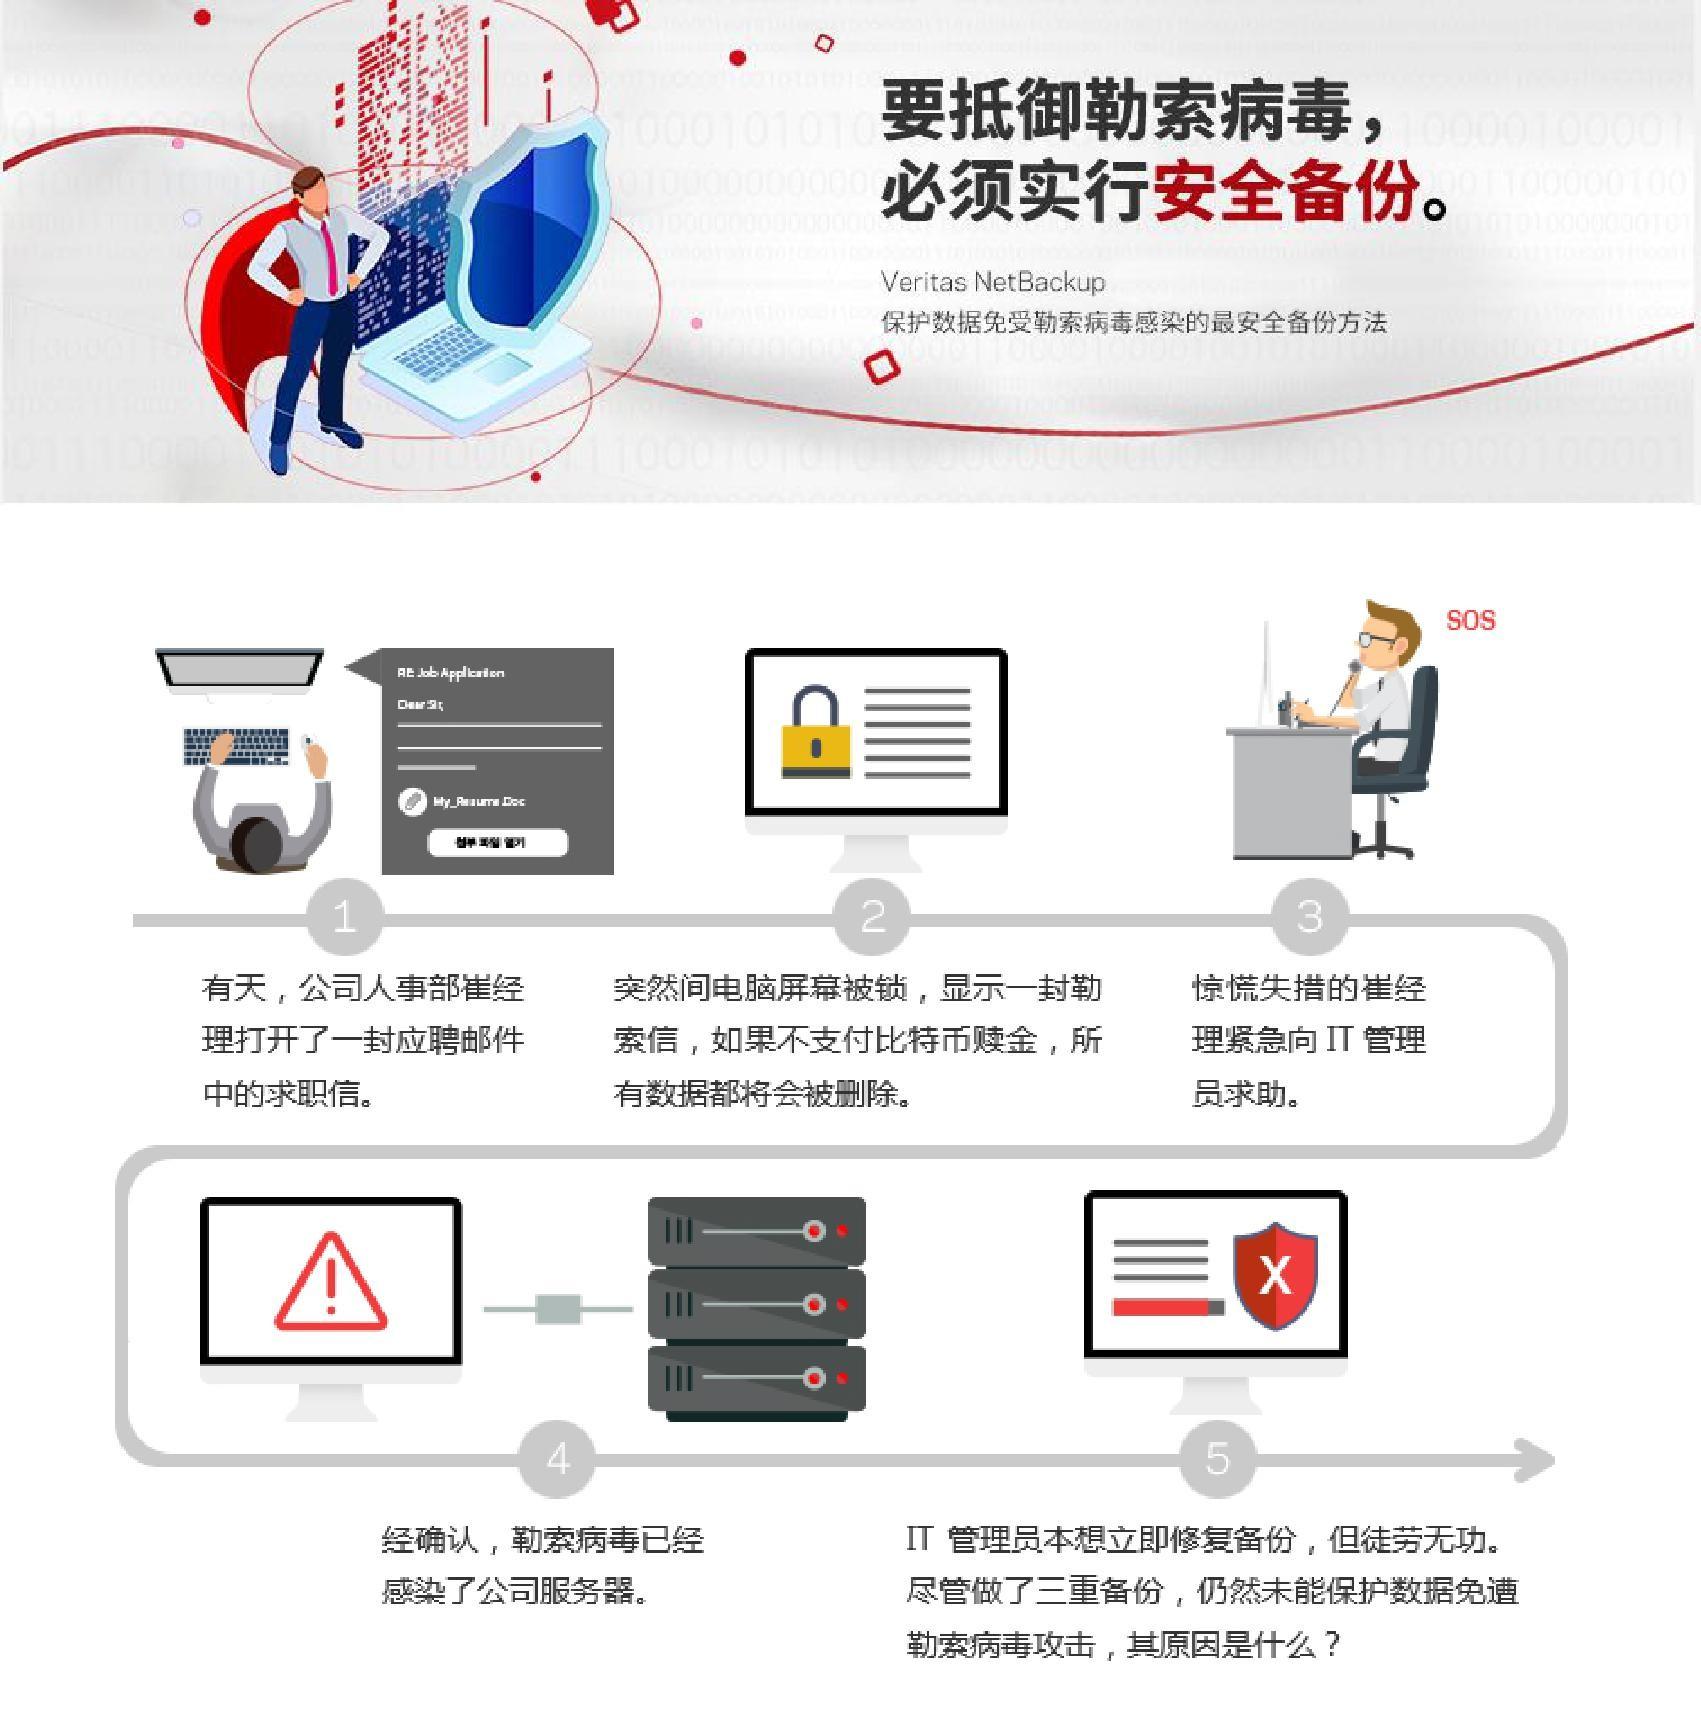 Veritas NetBackup 保护企业远离勒索软件攻击